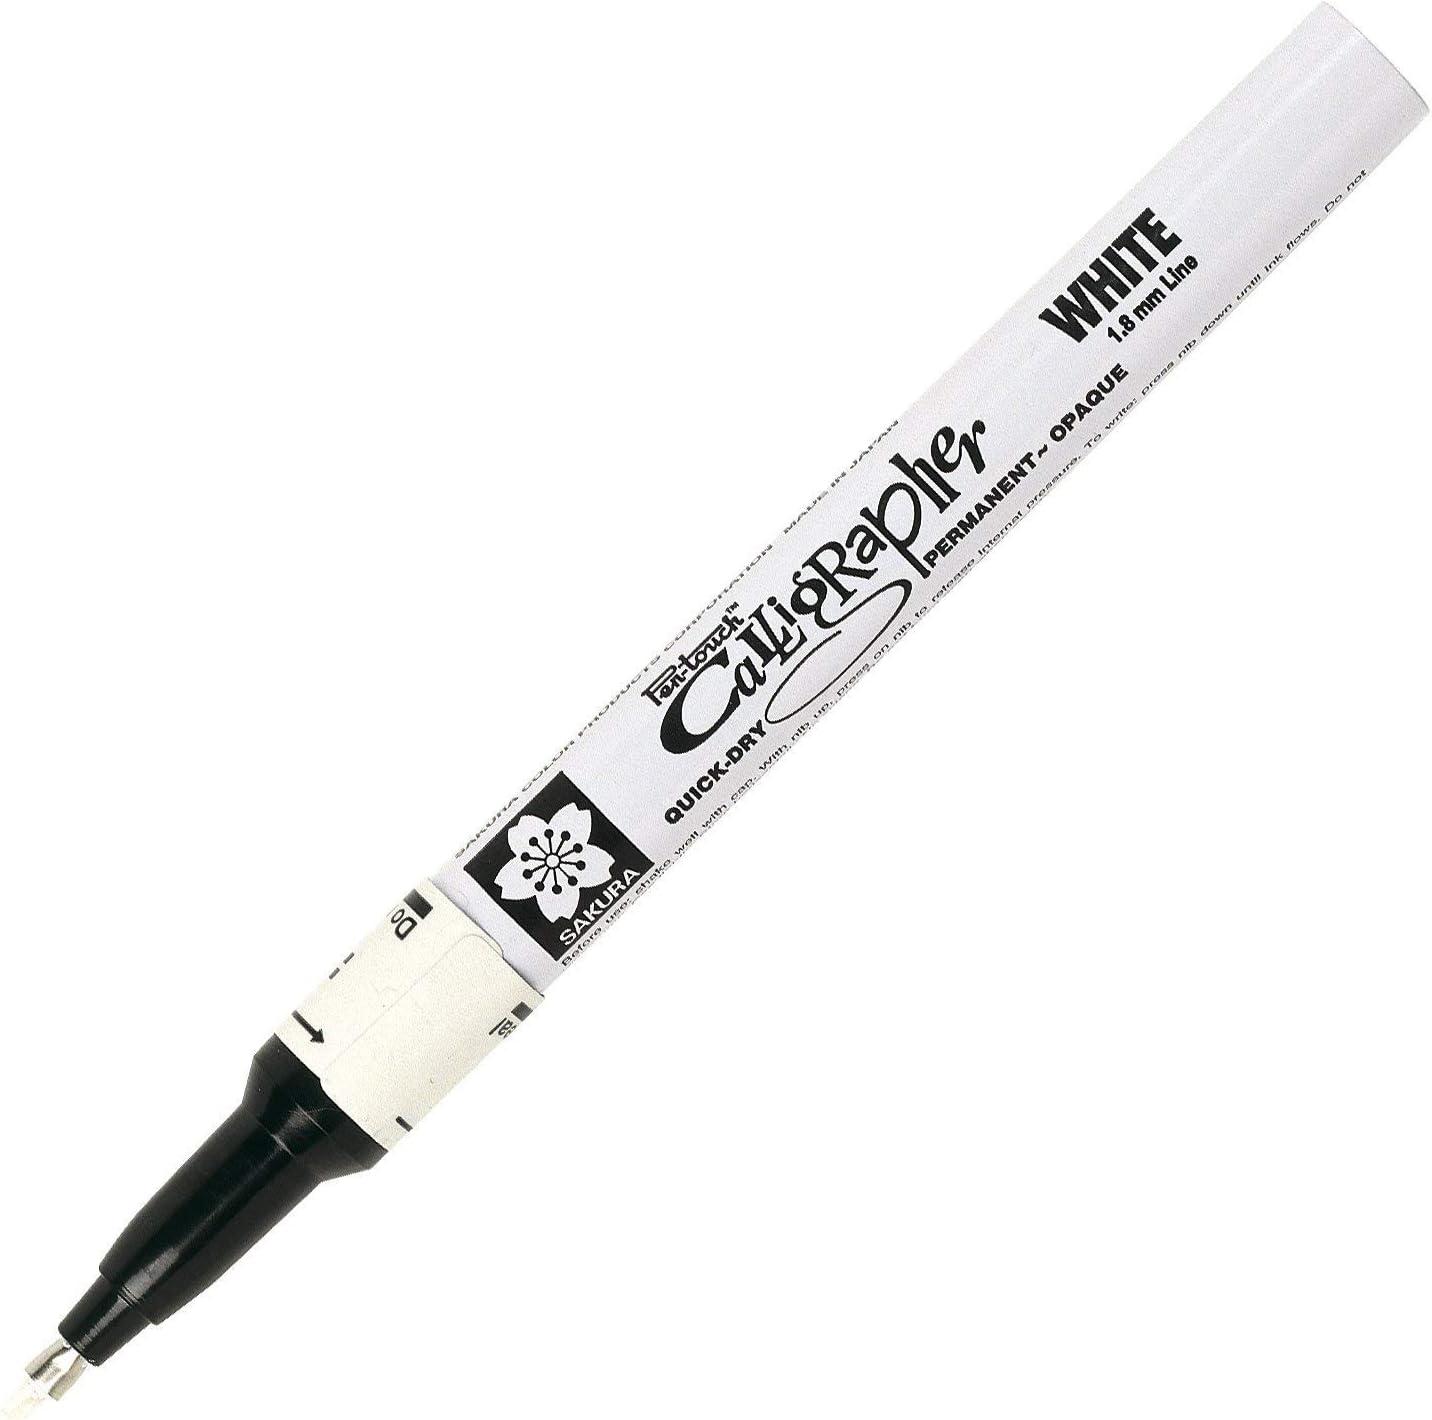 1.8mm Line Sakura Pen-Touch CALLIGRAPHY Pen WHITE